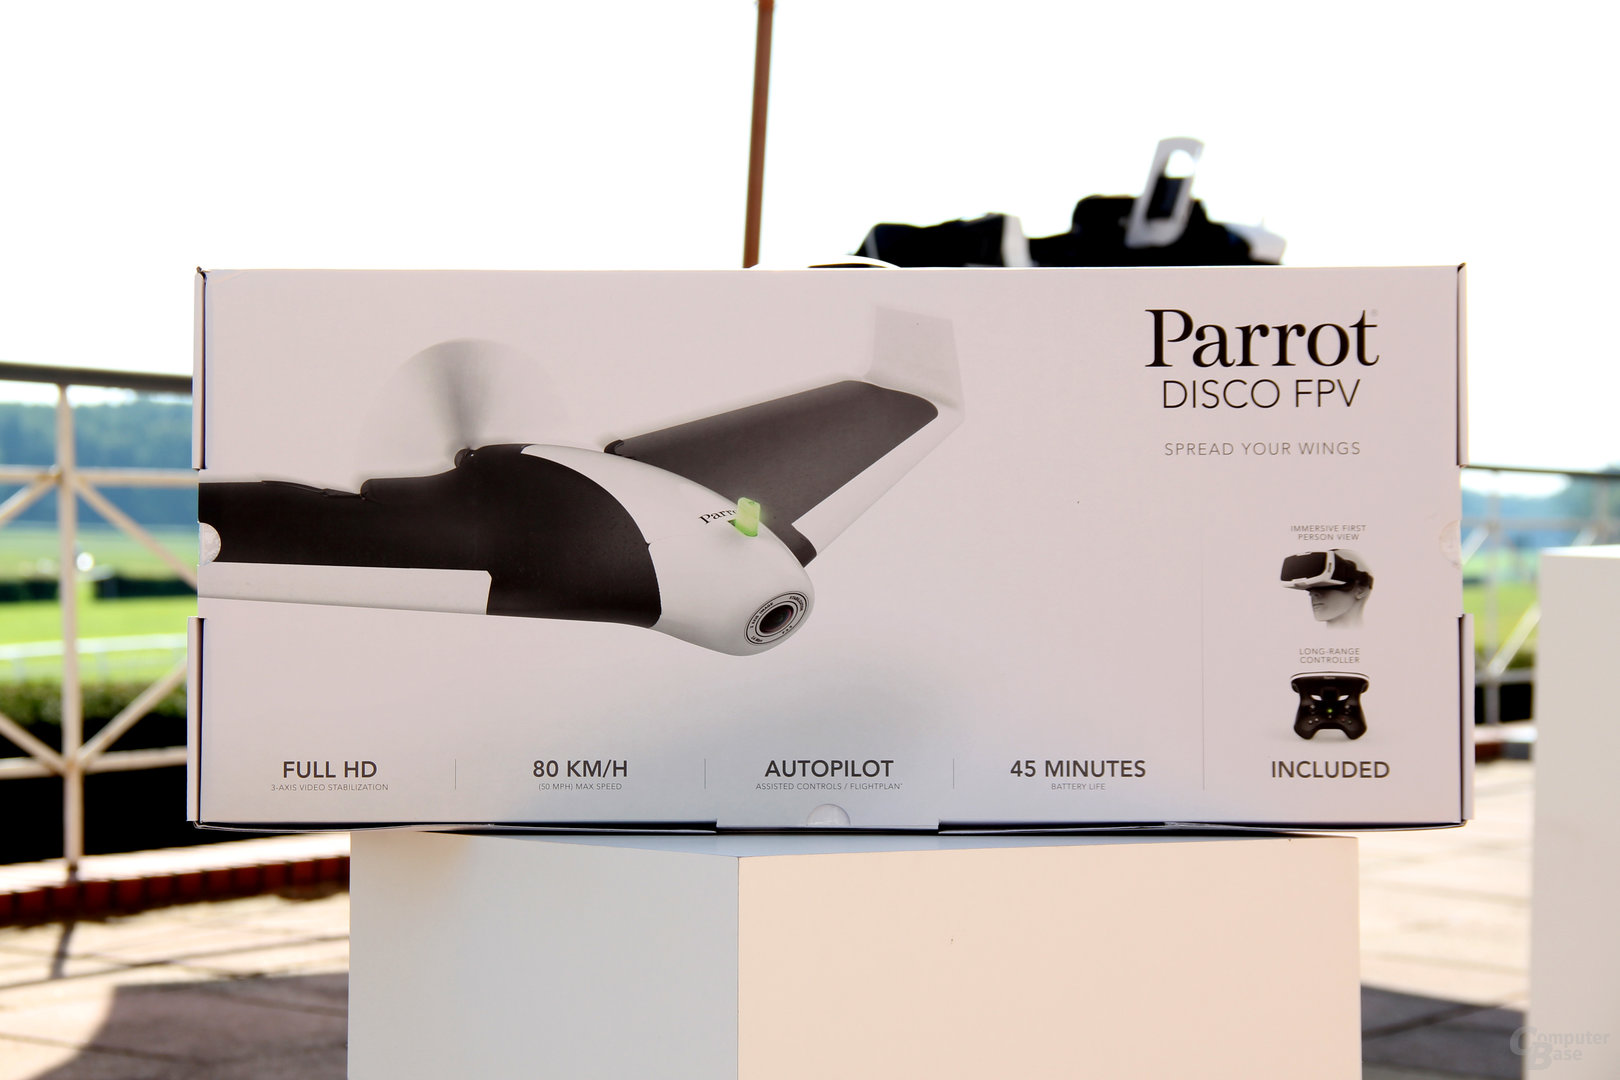 OVP der Parrot Disco